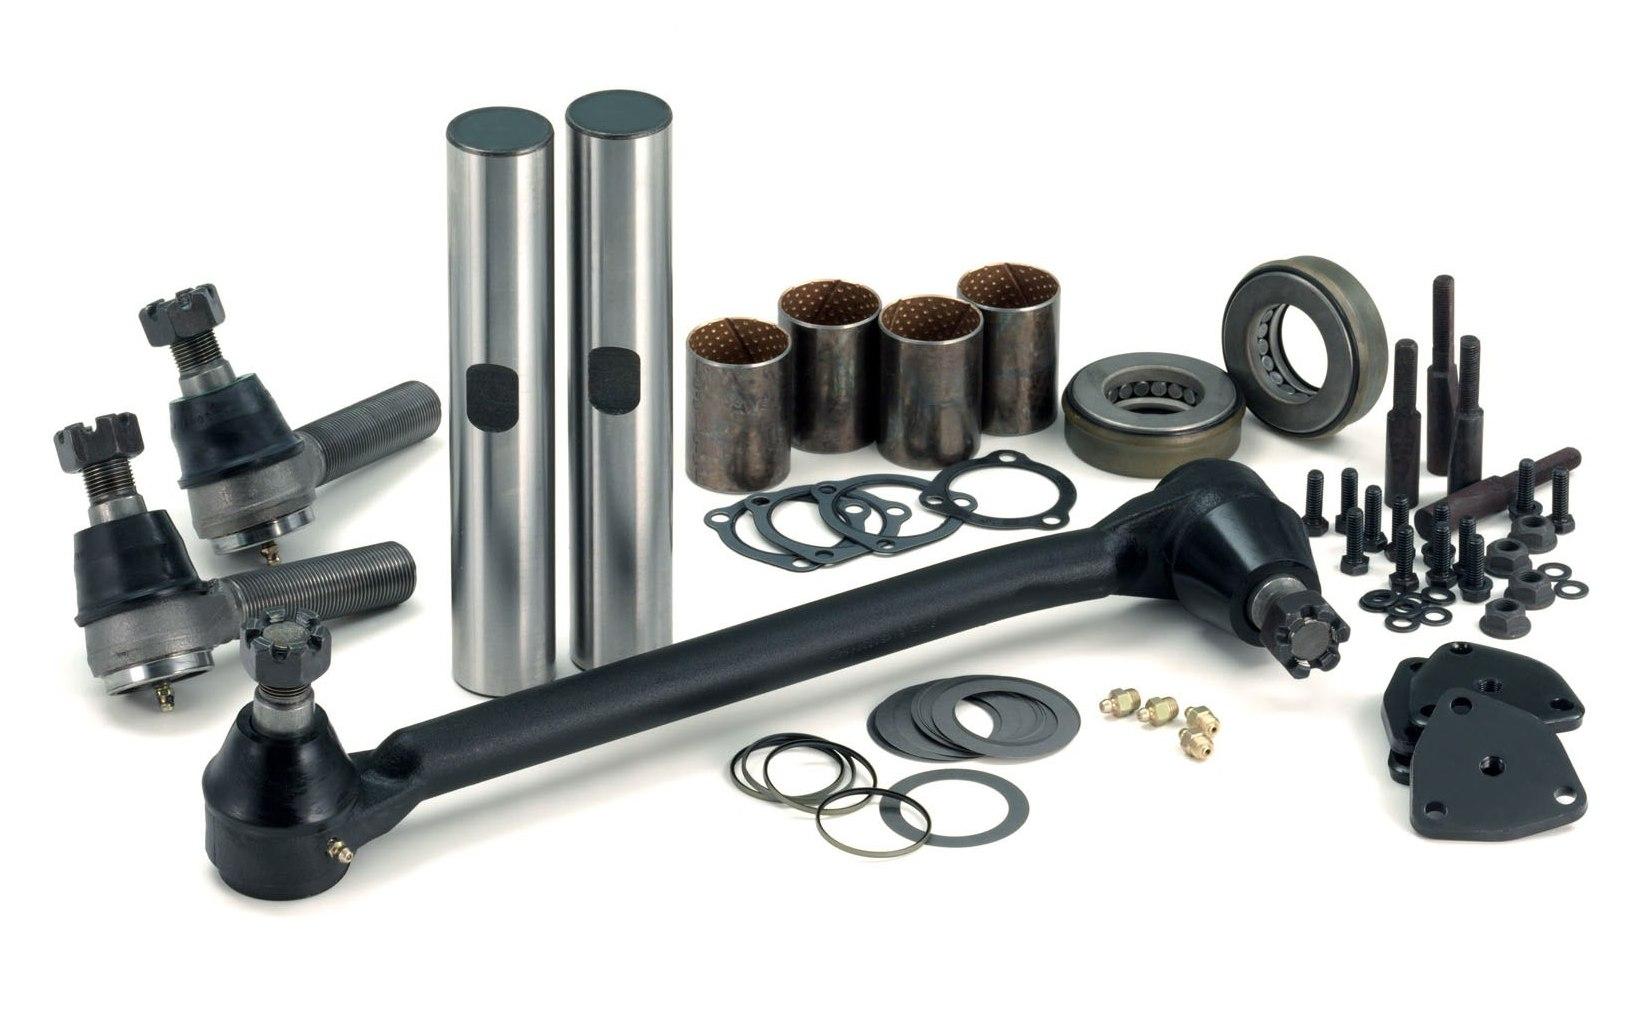 Meritor Drive Axle Parts : Meritor product photos